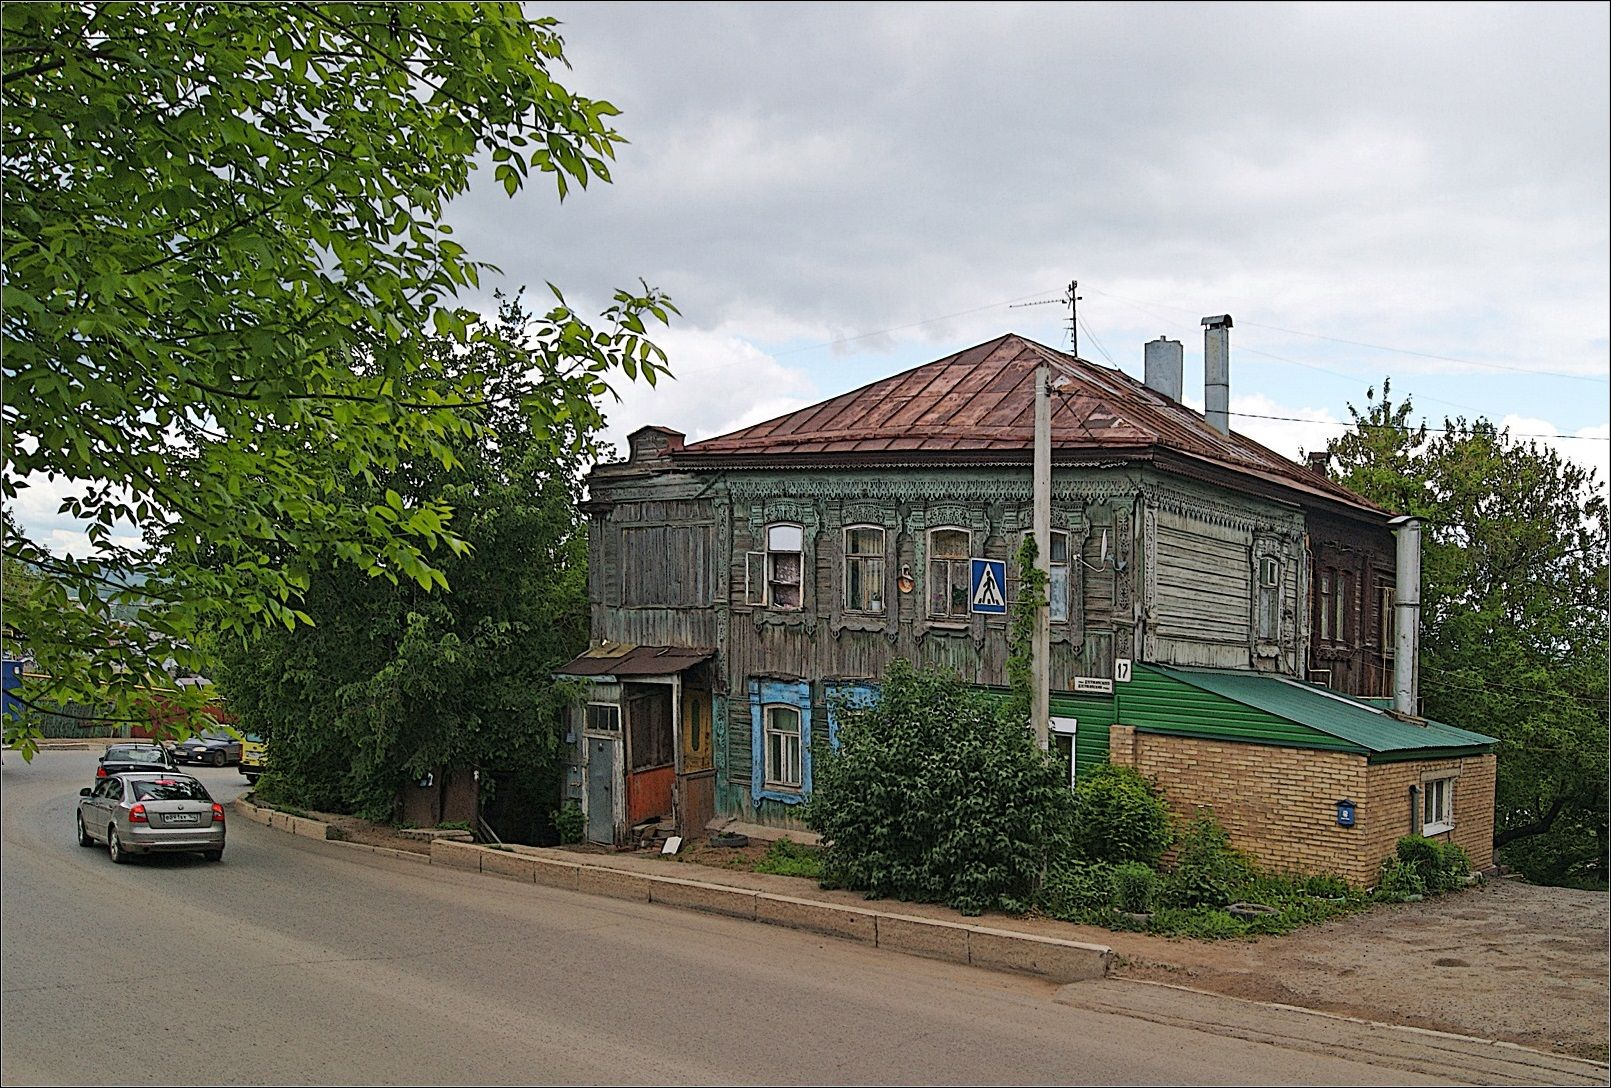 Дом у дороги город улица старый дом